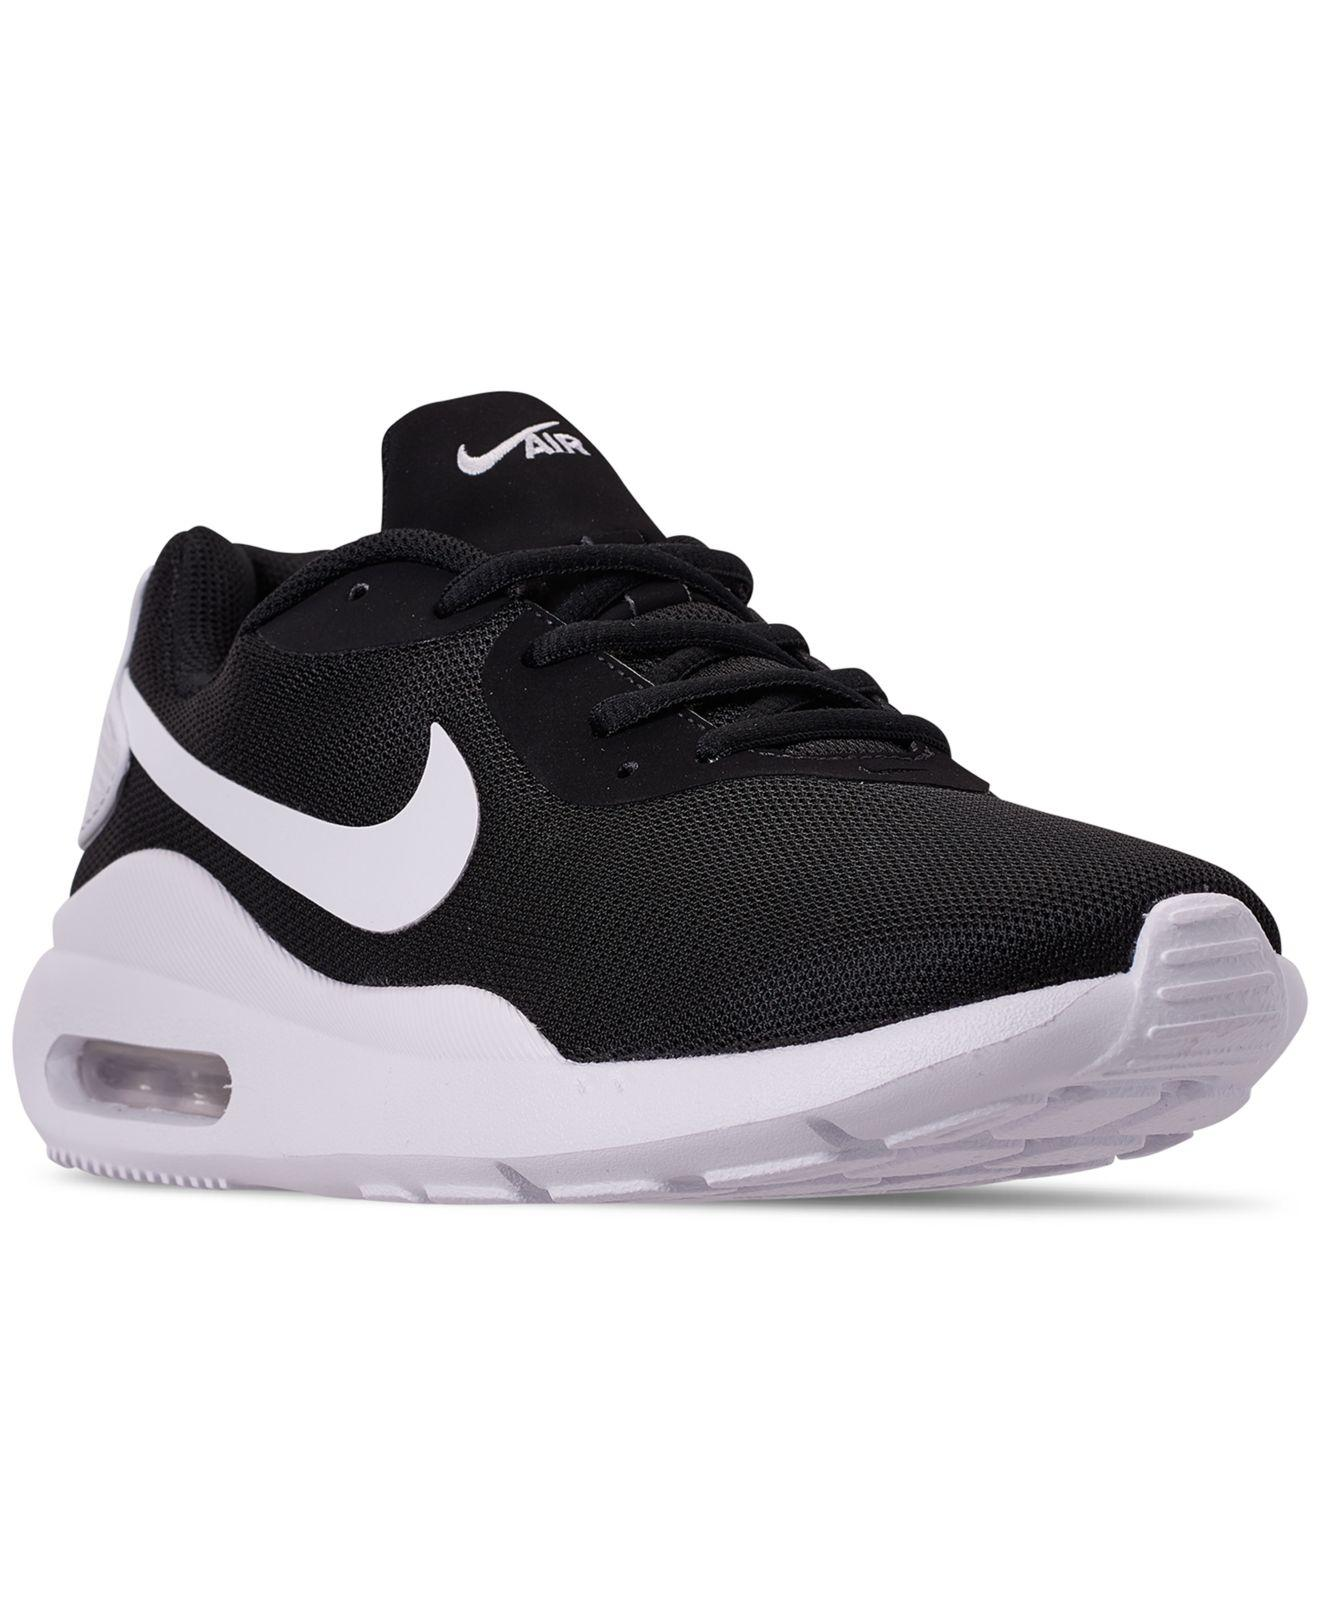 1285bbb20e673 Lyst - Nike Air Max Oketo Shoe in Black for Men - Save 1%